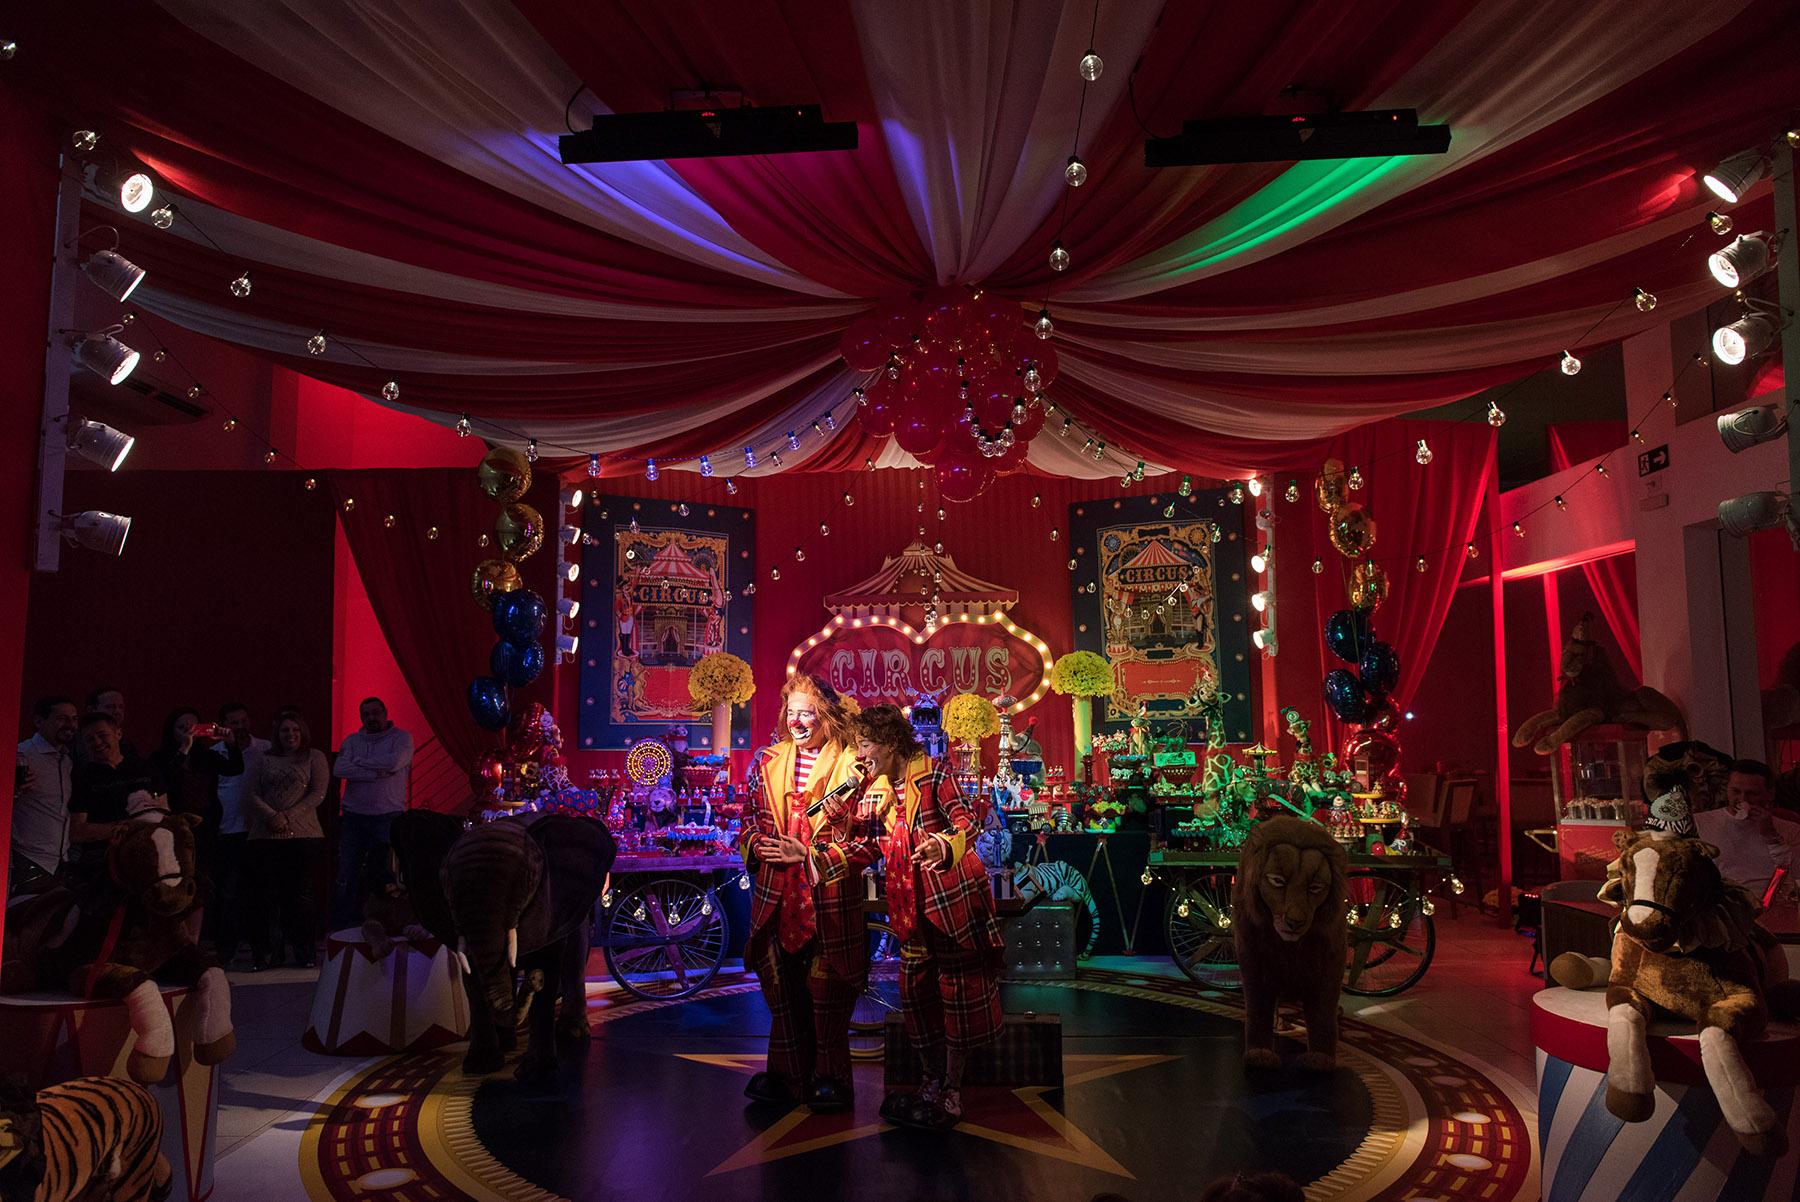 46_festa_infantil_curitiba_tema_circo.jpg